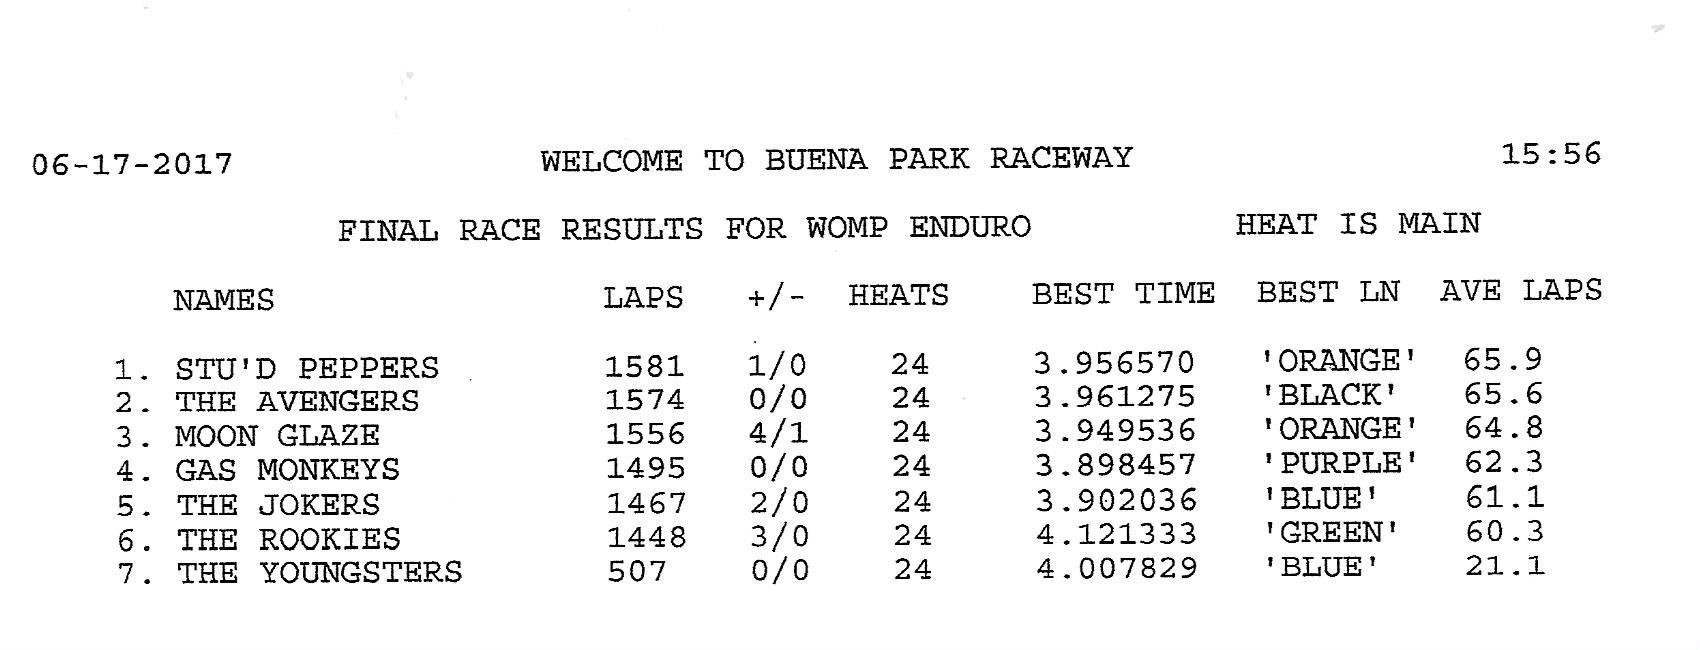 61717 womp enduro results.jpeg